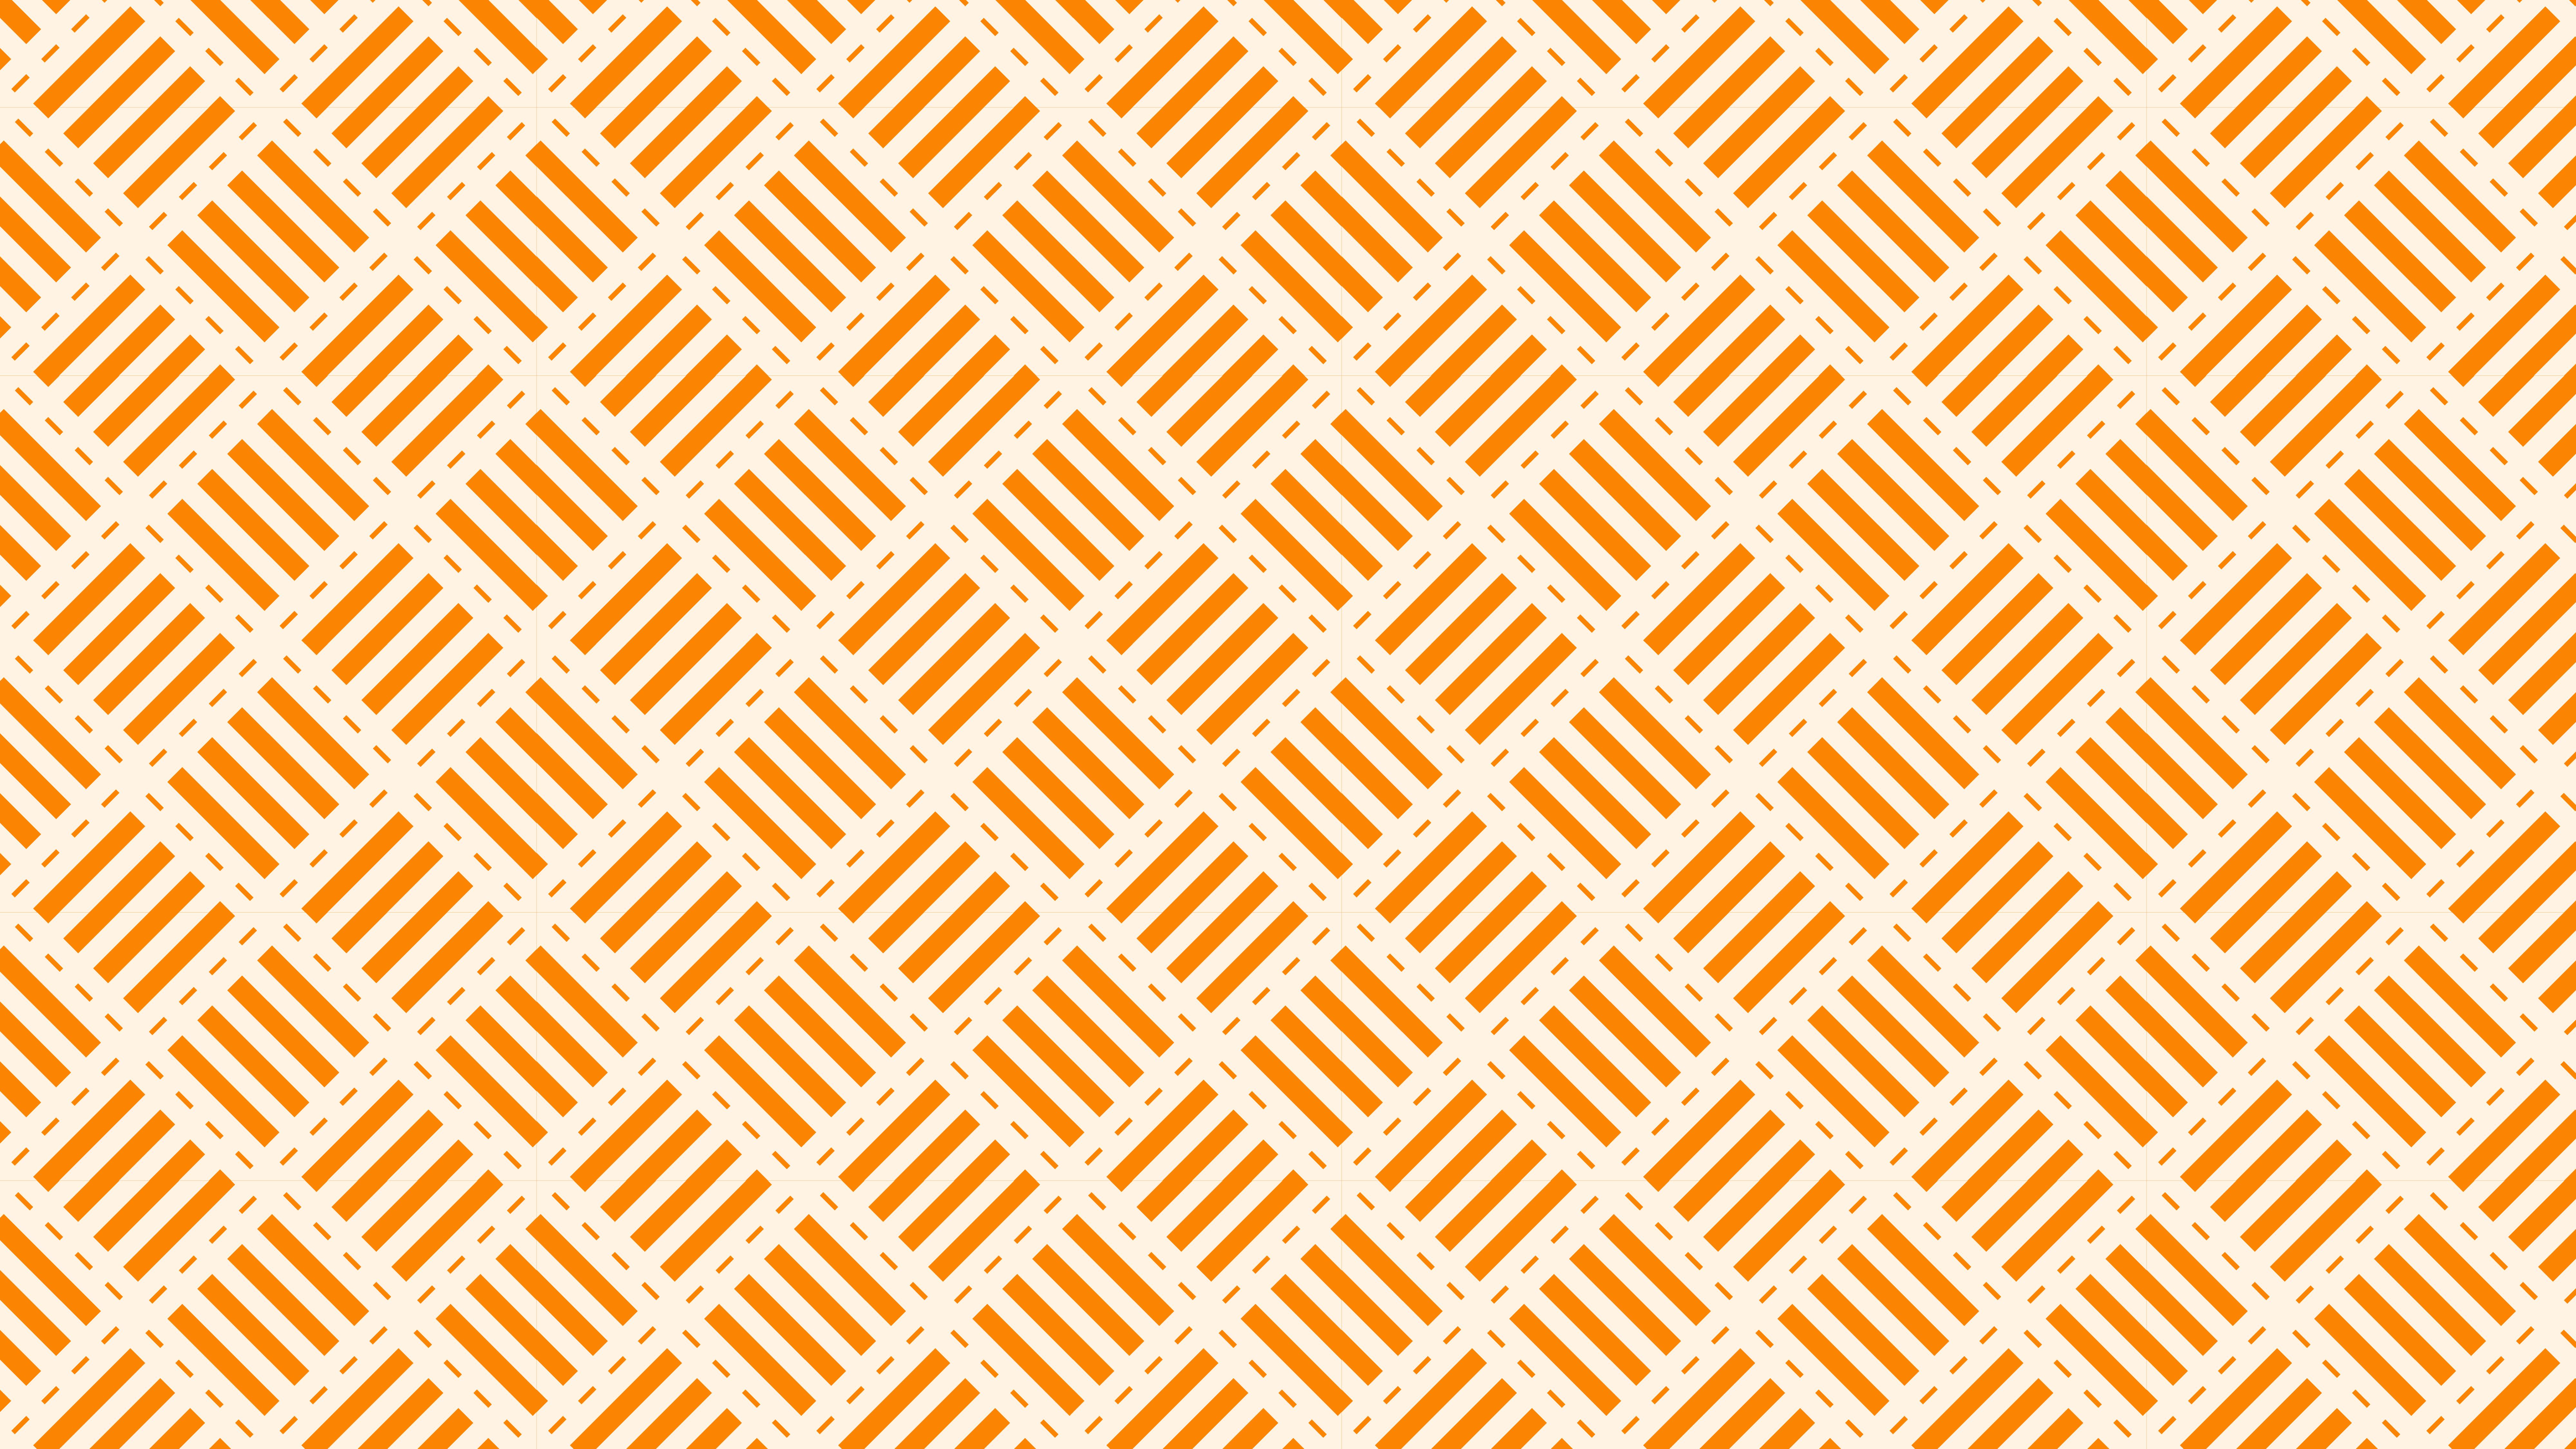 Unduh 100 Background Orange Stripes Gratis Terbaru